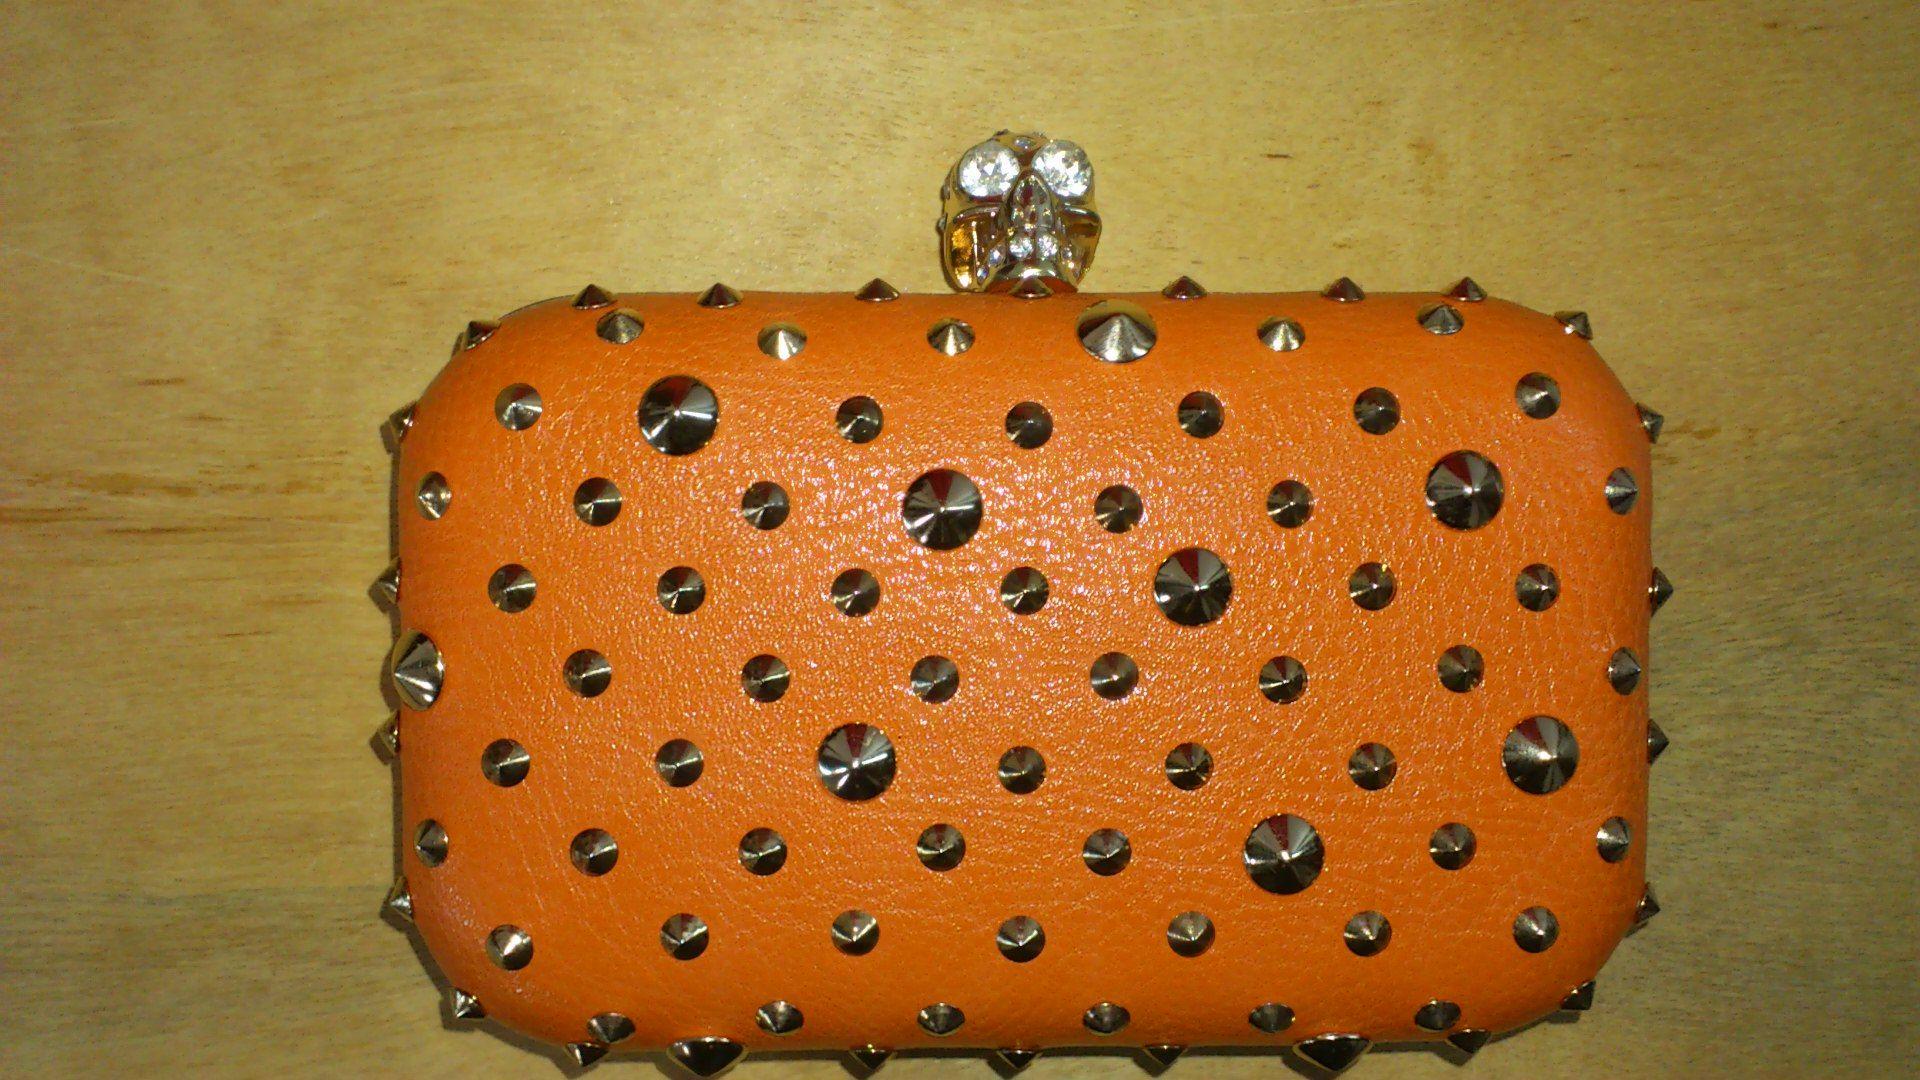 China Manufacturer Fashion lady handbag